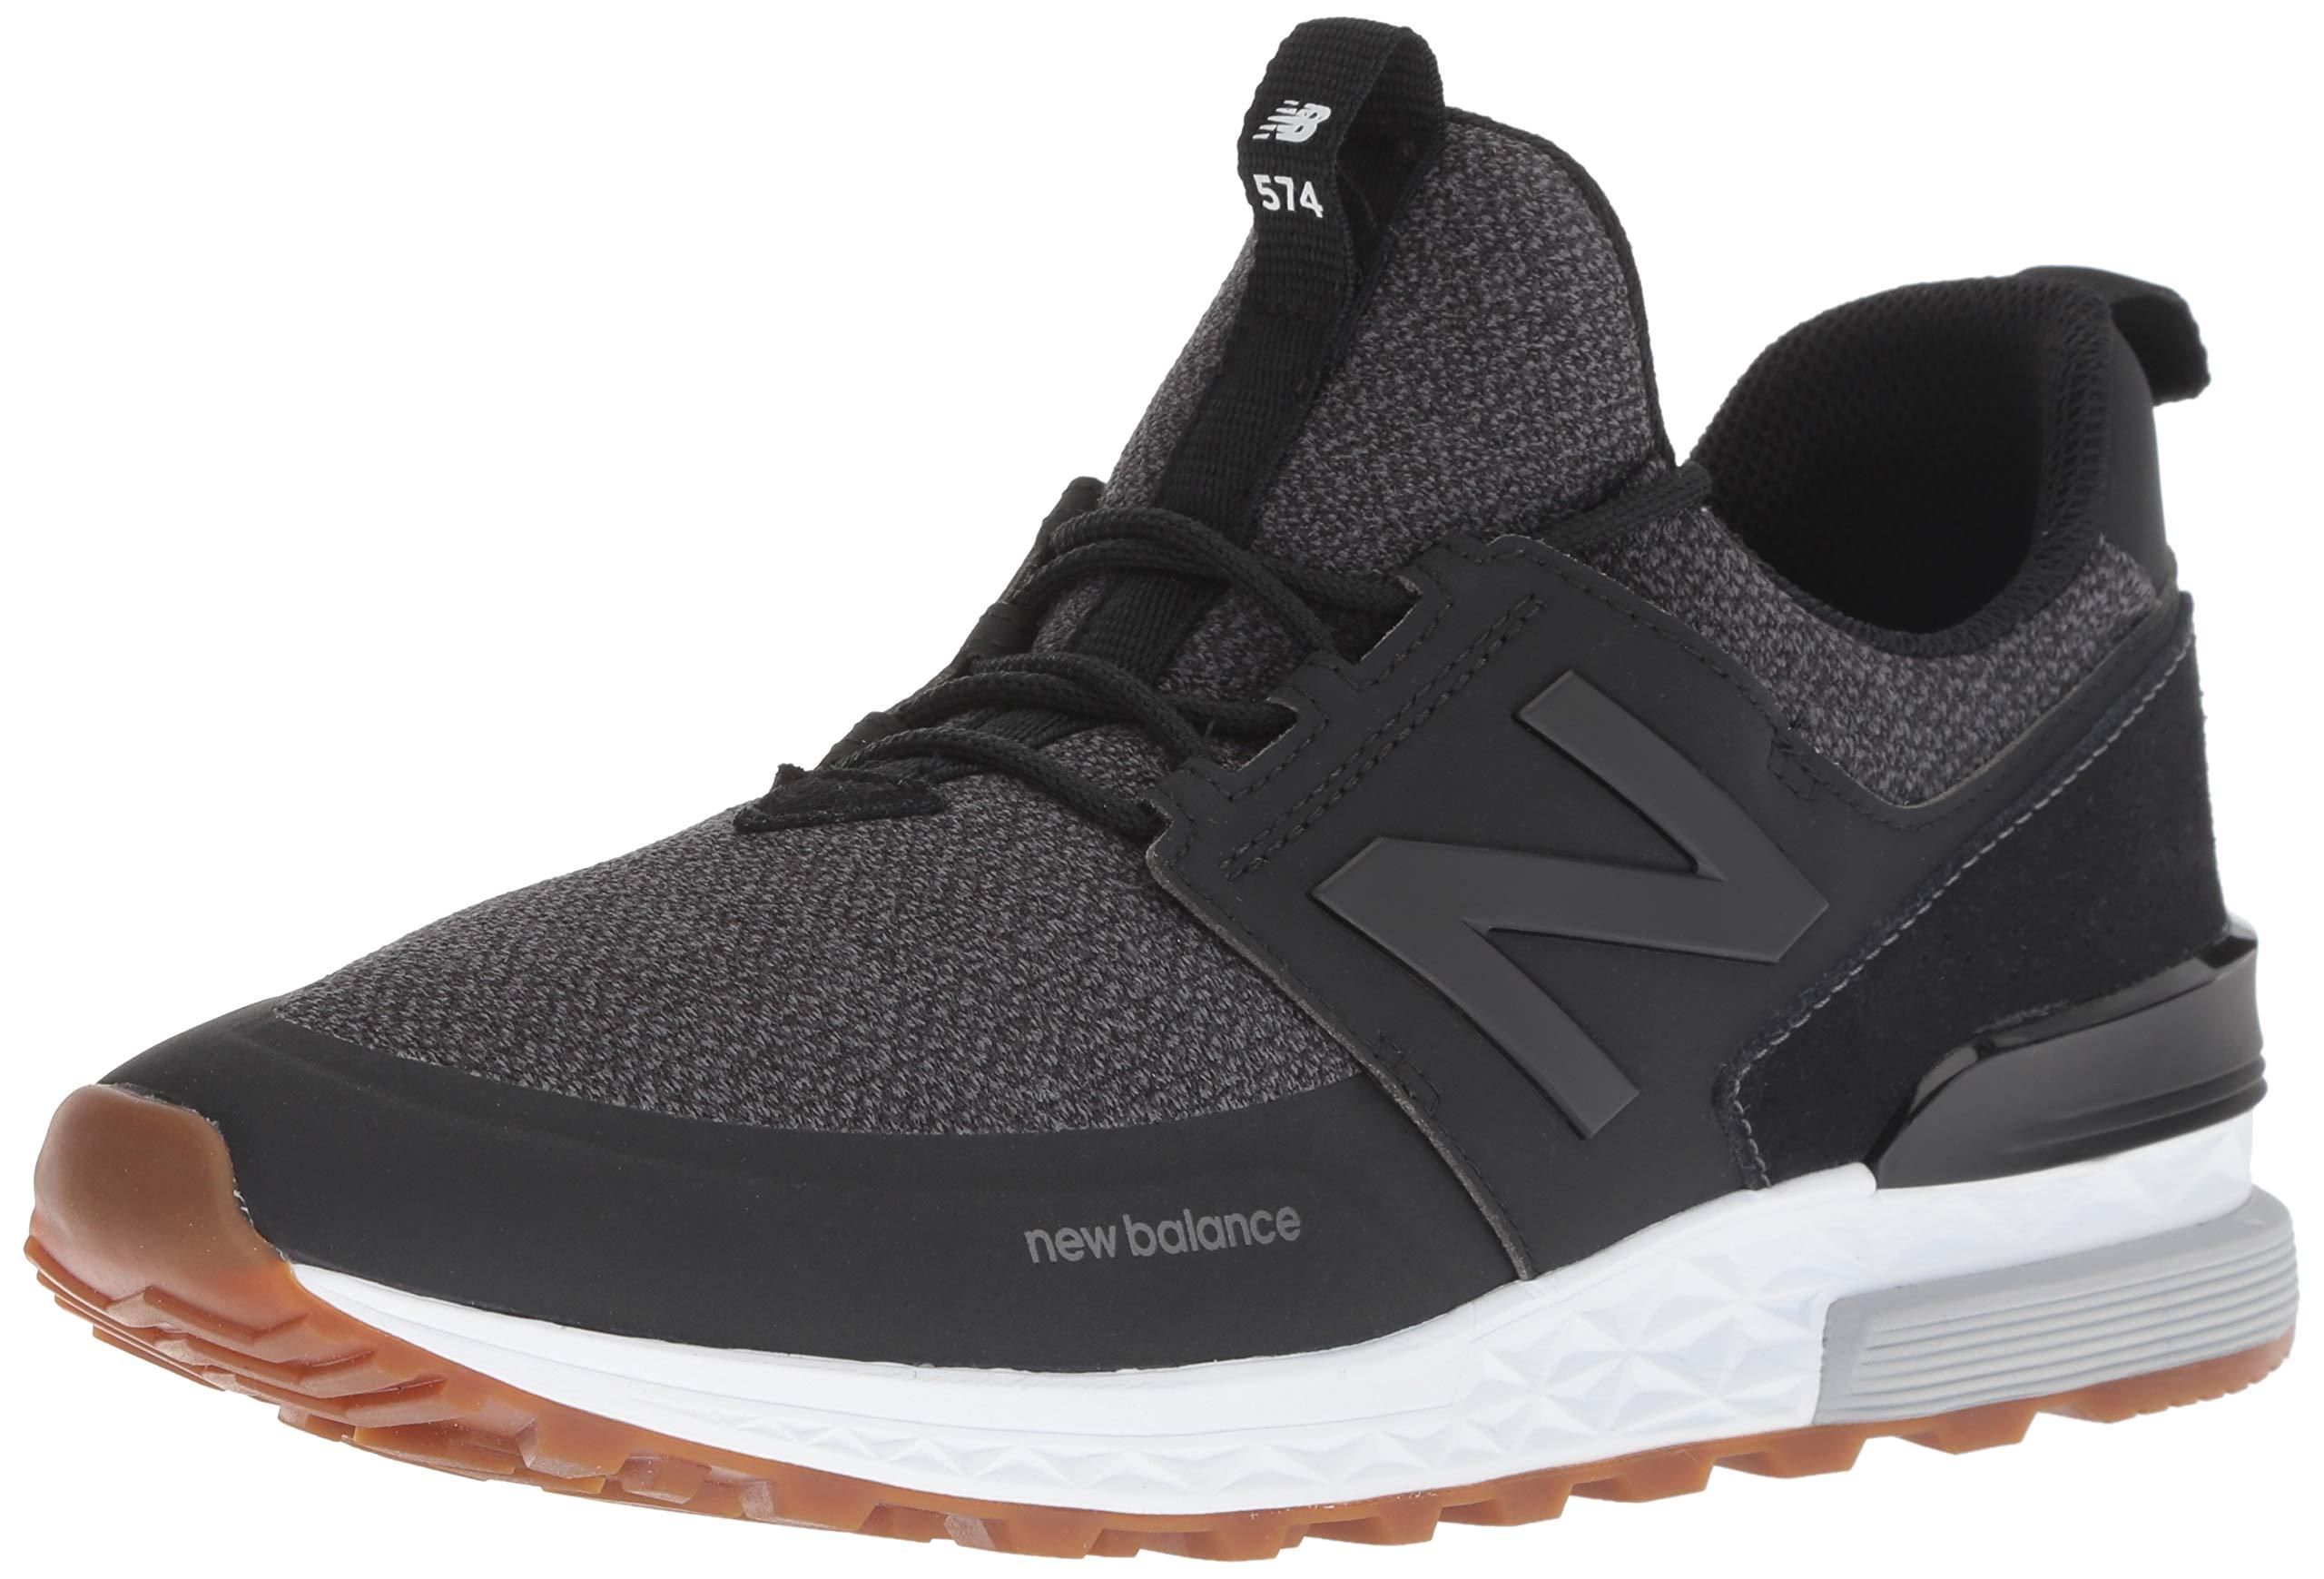 low priced 1f647 93633 New Balance Men's 574S Sport Sneaker, Black/Magnet, 14 D US